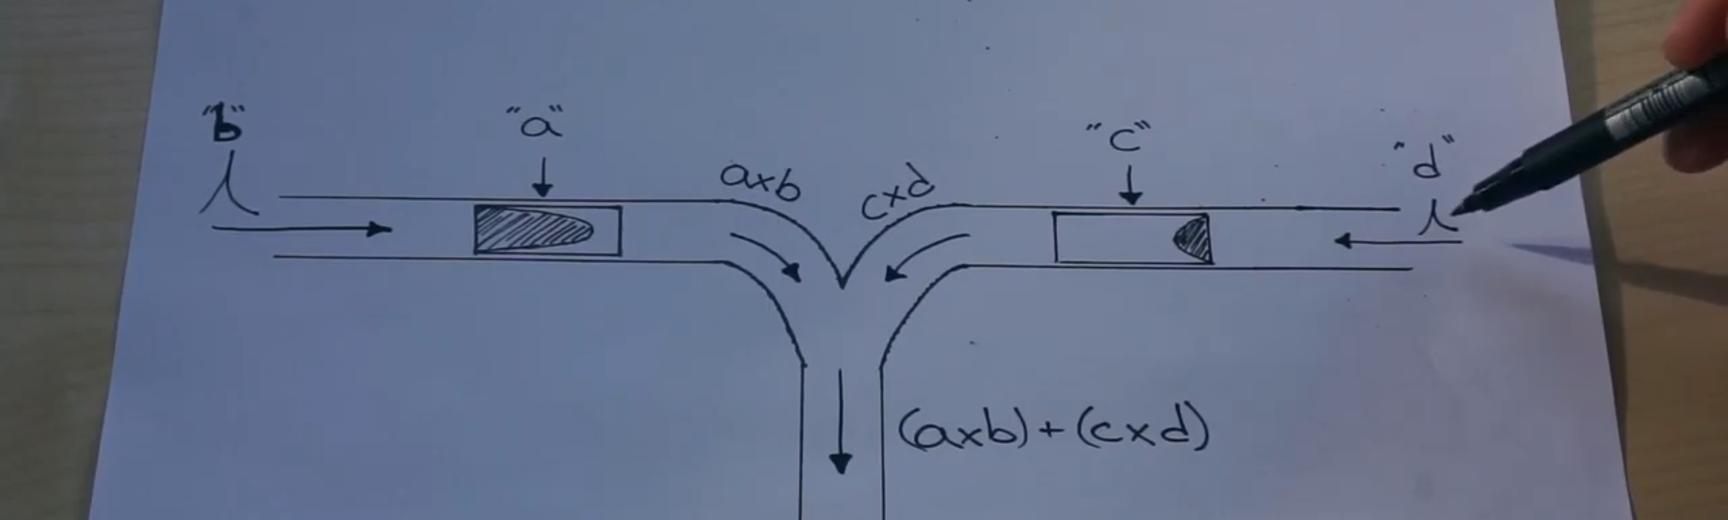 nathan multiplication explained